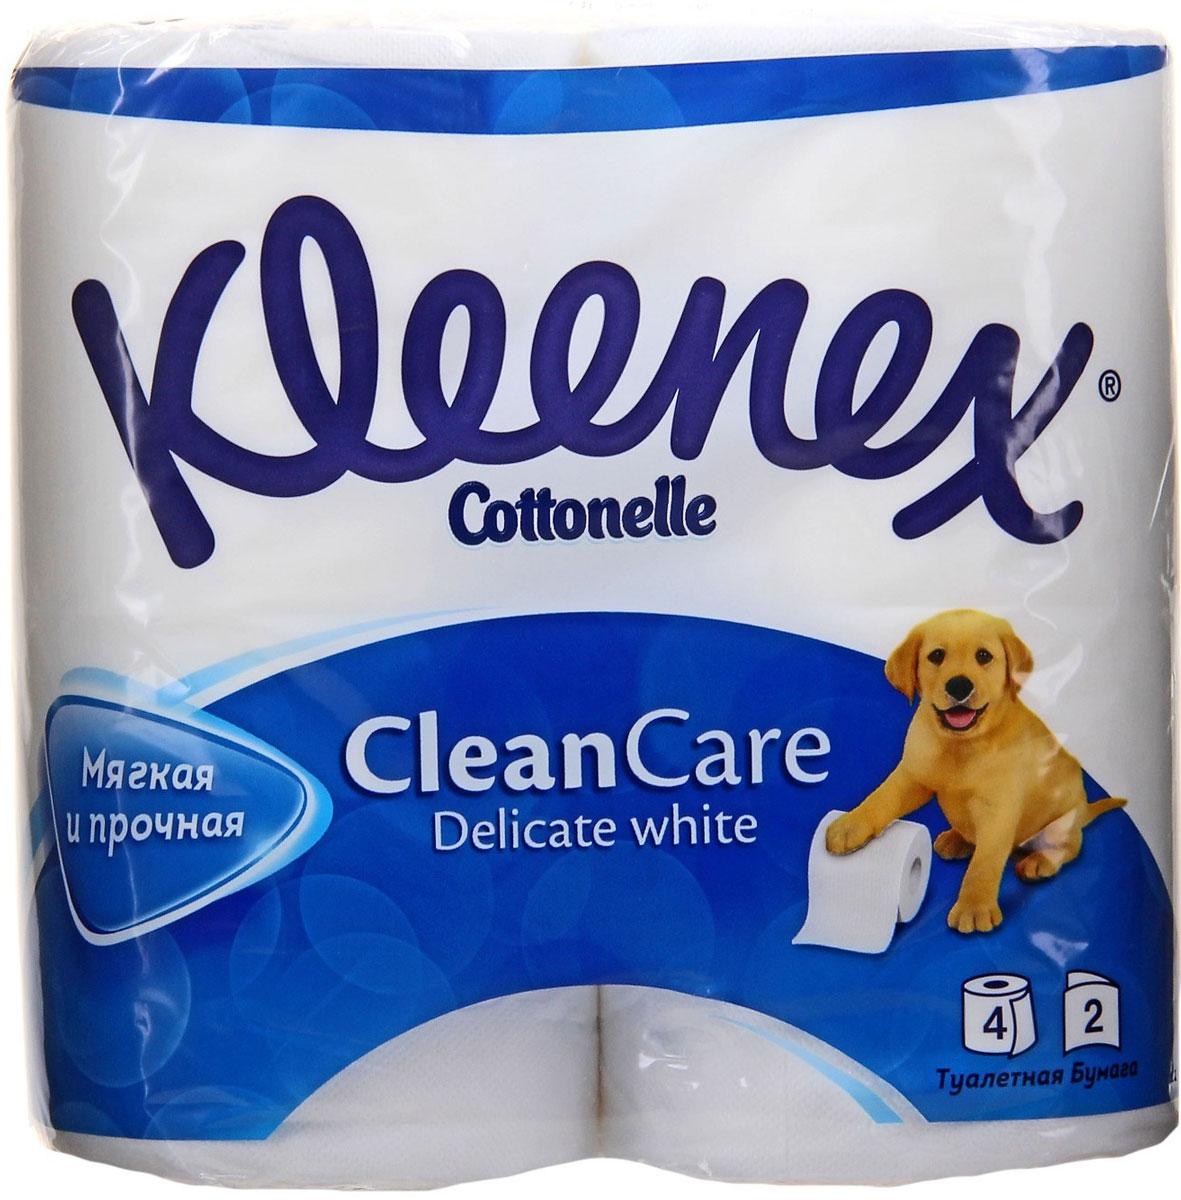 Туалетная бумага Kleenex Delicate White, двухслойная, цвет: белый, 4 рулона туалетная бумага familia plus магический цветок двухслойная цвет белый 4 шт